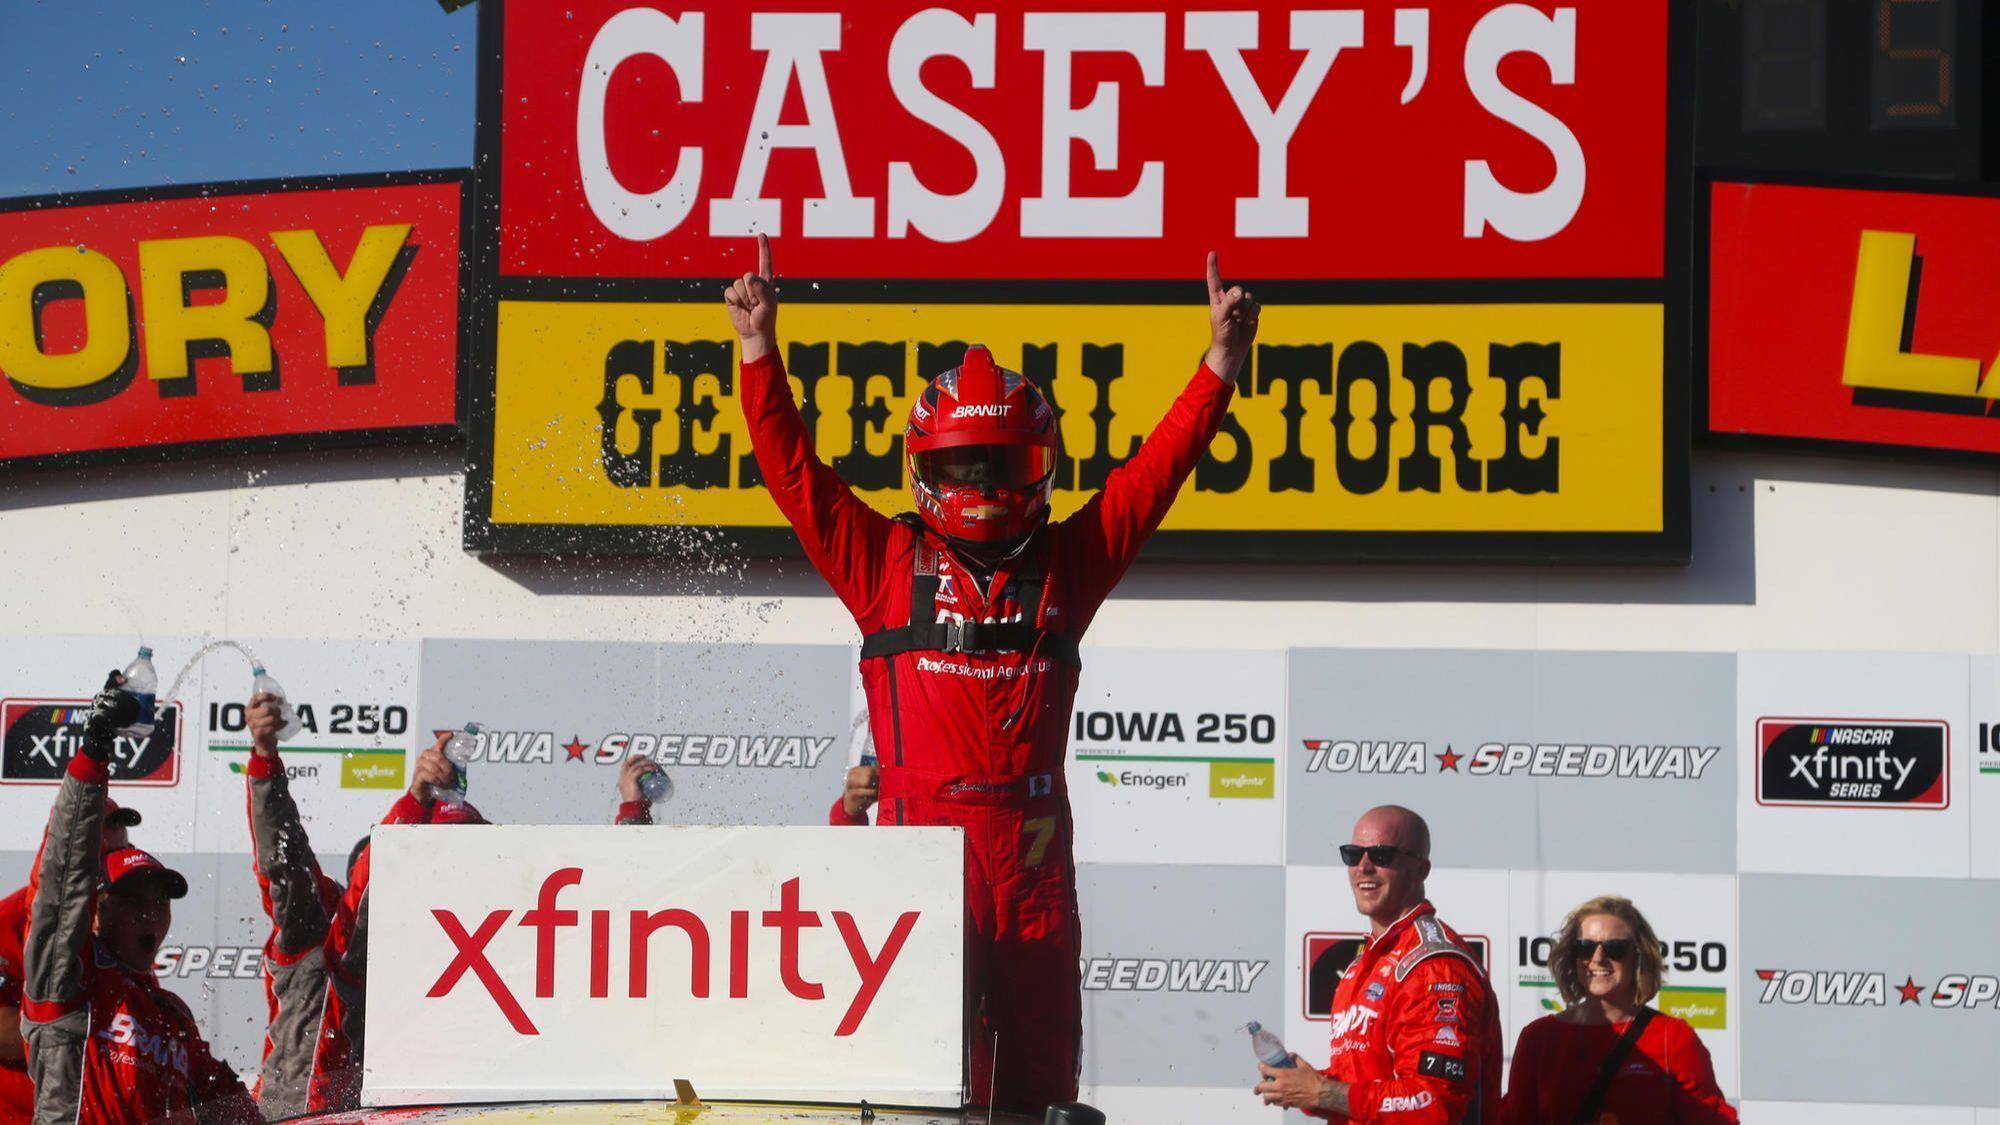 Justin Allgaier wins Xfinity race at Iowa